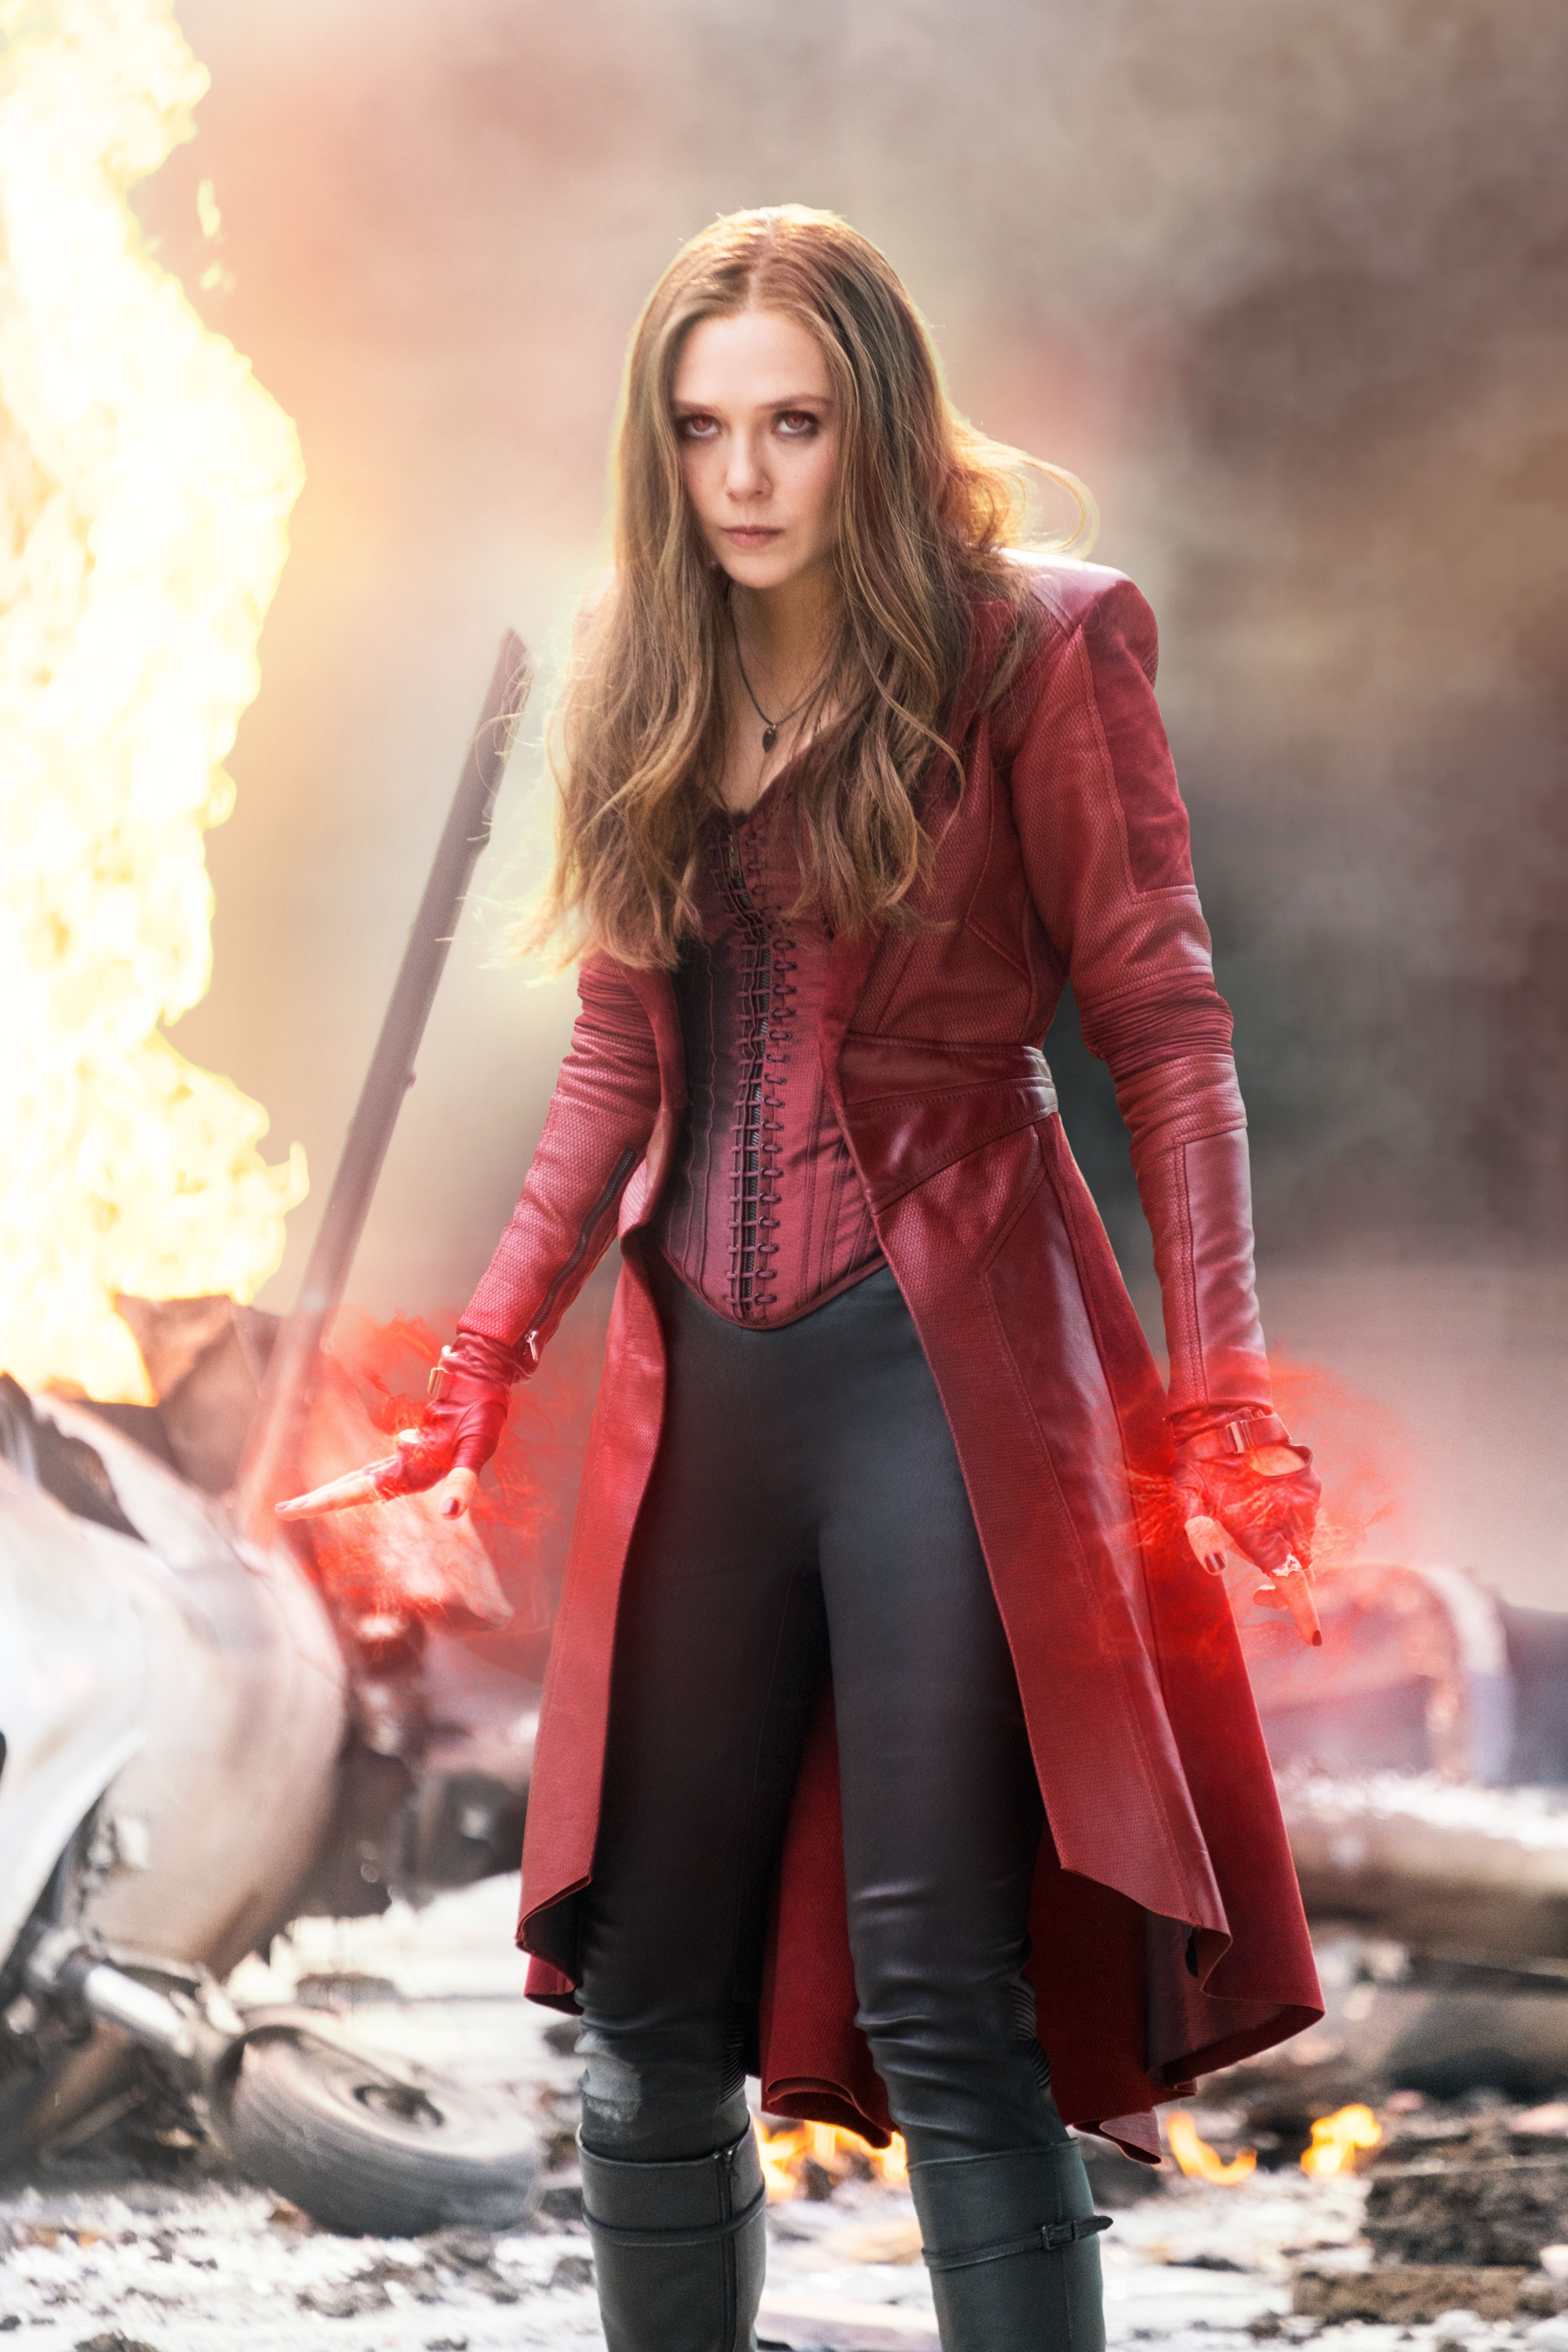 Captain America Civil War New Images Reveal Vision More Collider